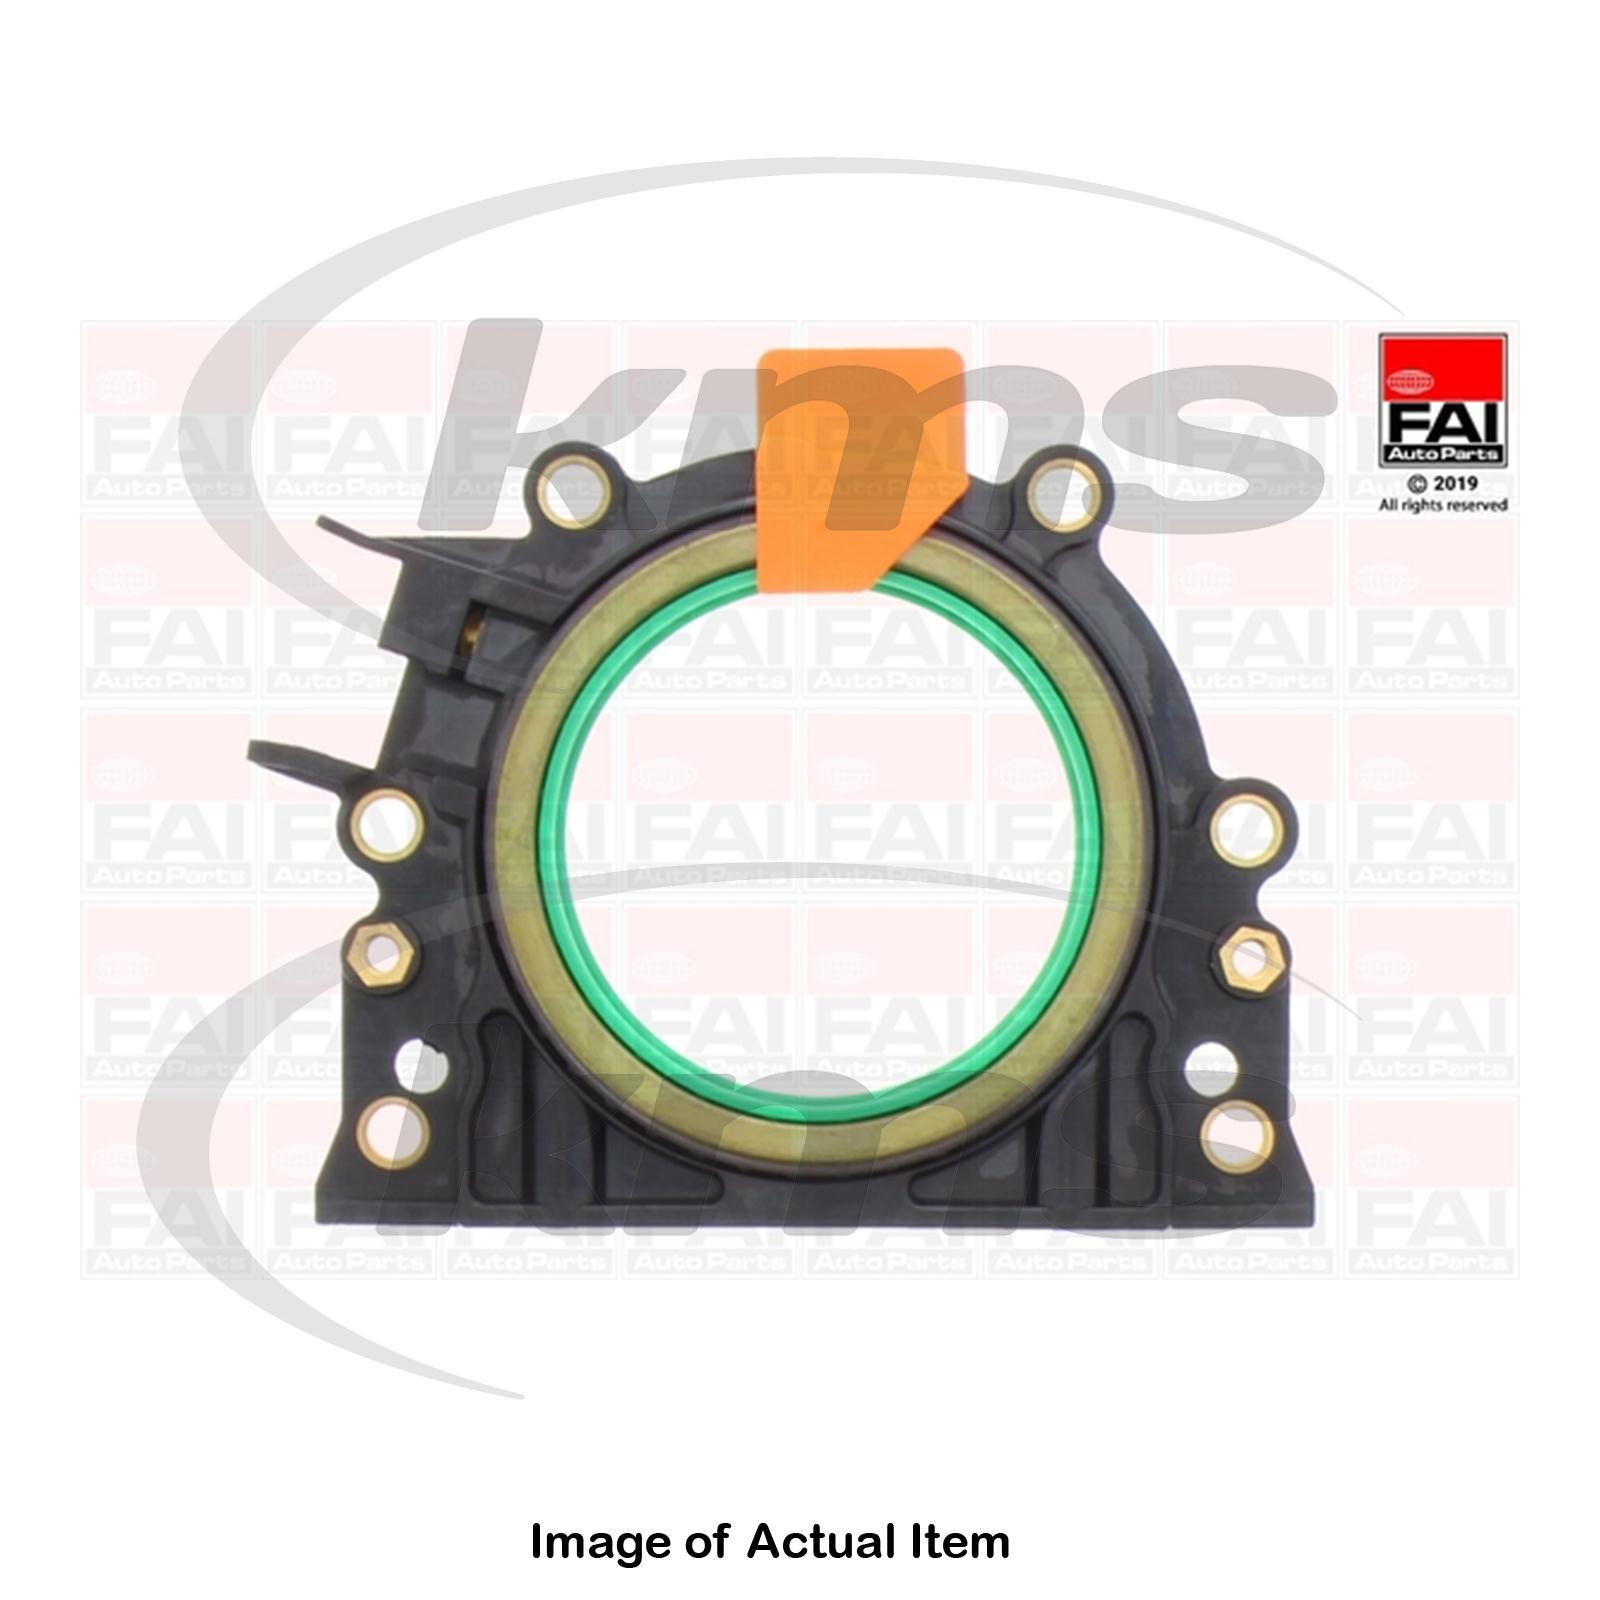 FAI Crankshaft Oil Shaft Seal OS1360 BRAND NEW GENUINE 5 YEAR WARRANTY